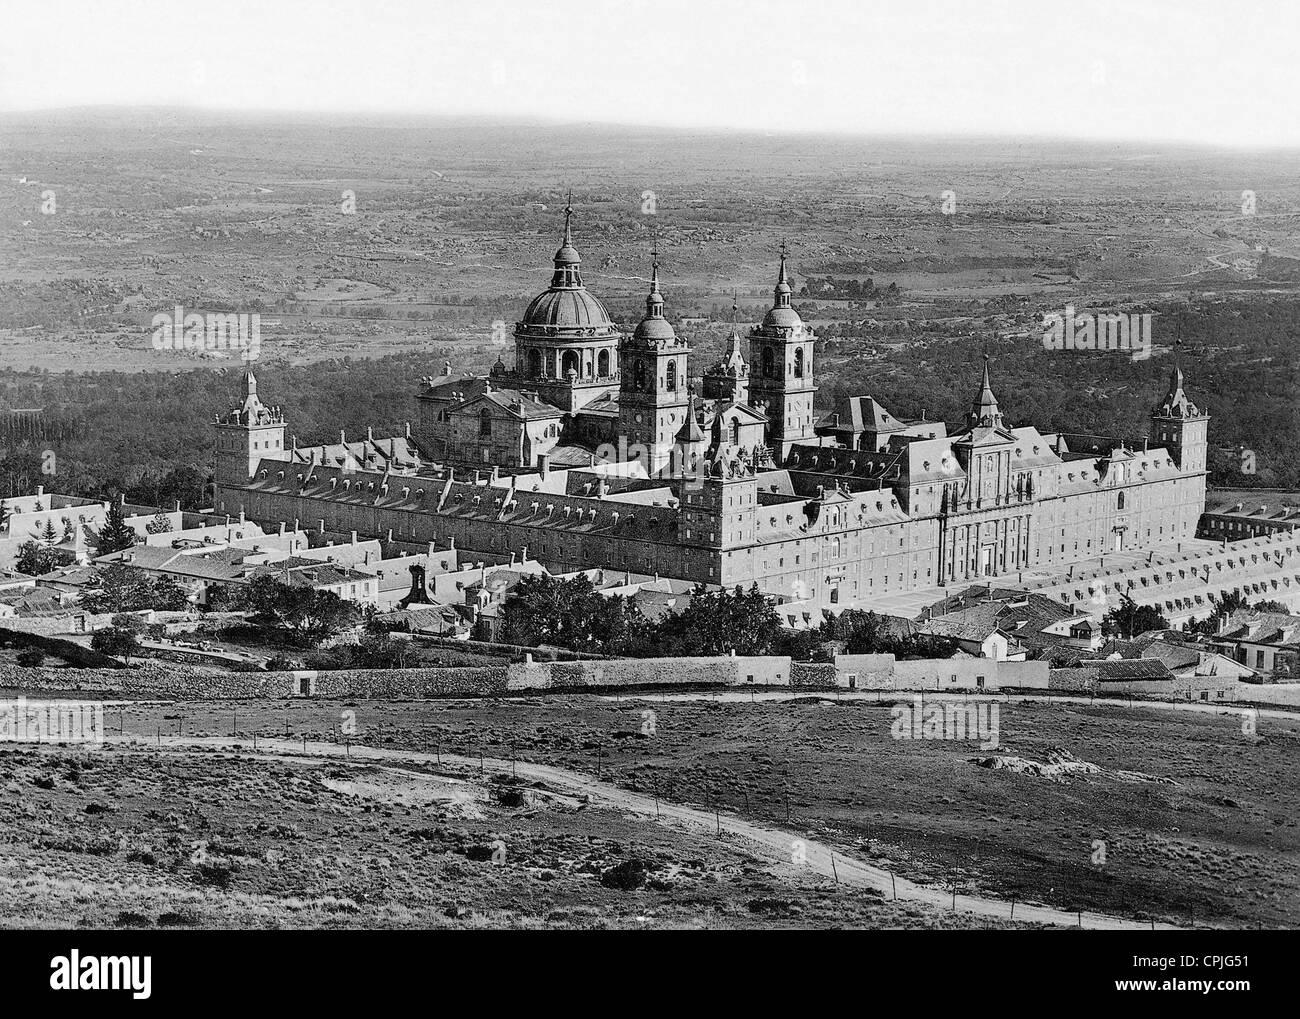 Monastery of El Escorial, 1899 Stock Photo